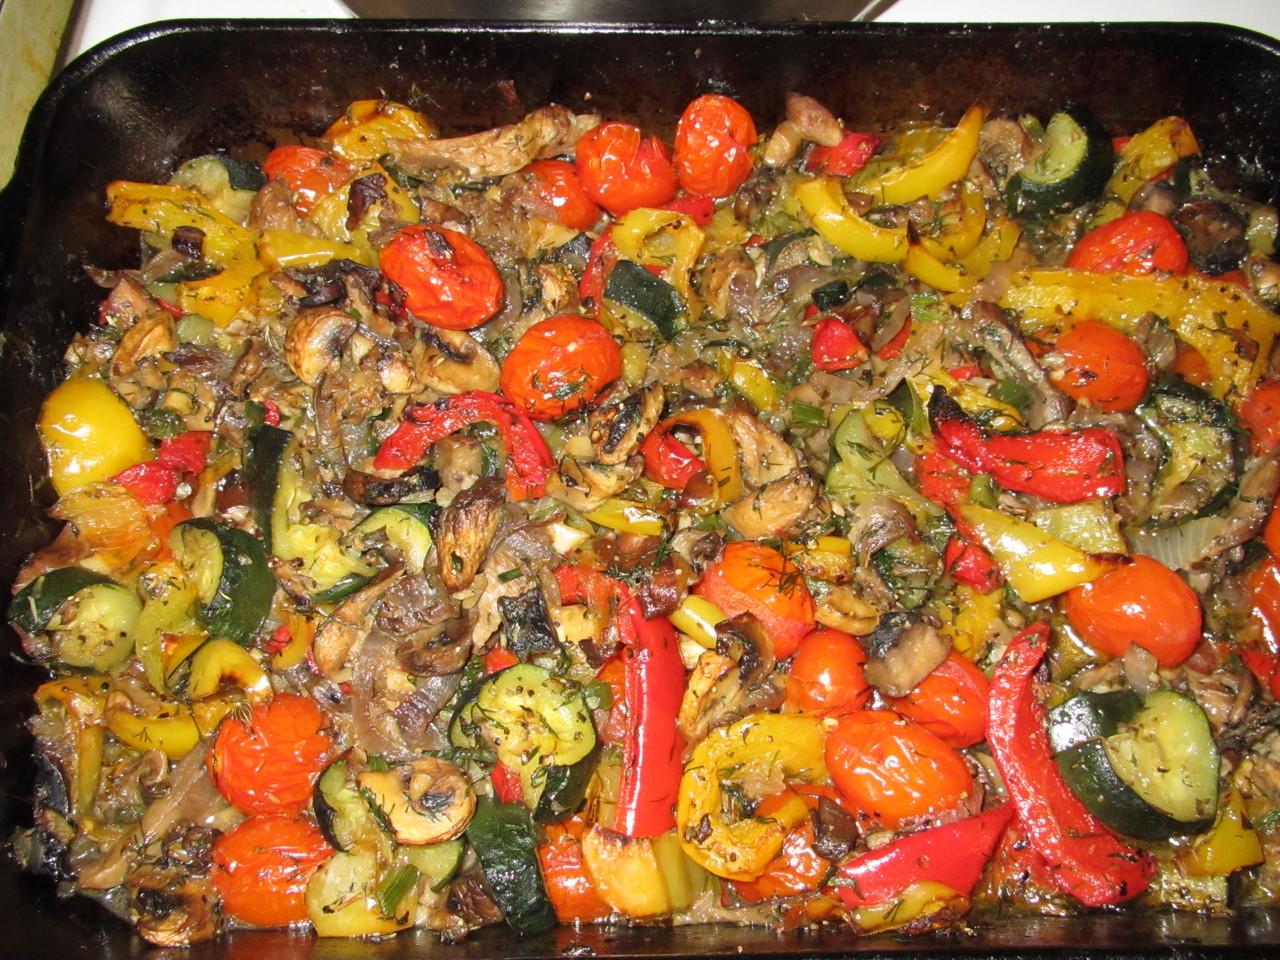 Casserole с грибами, цуккини и болгарским перцем